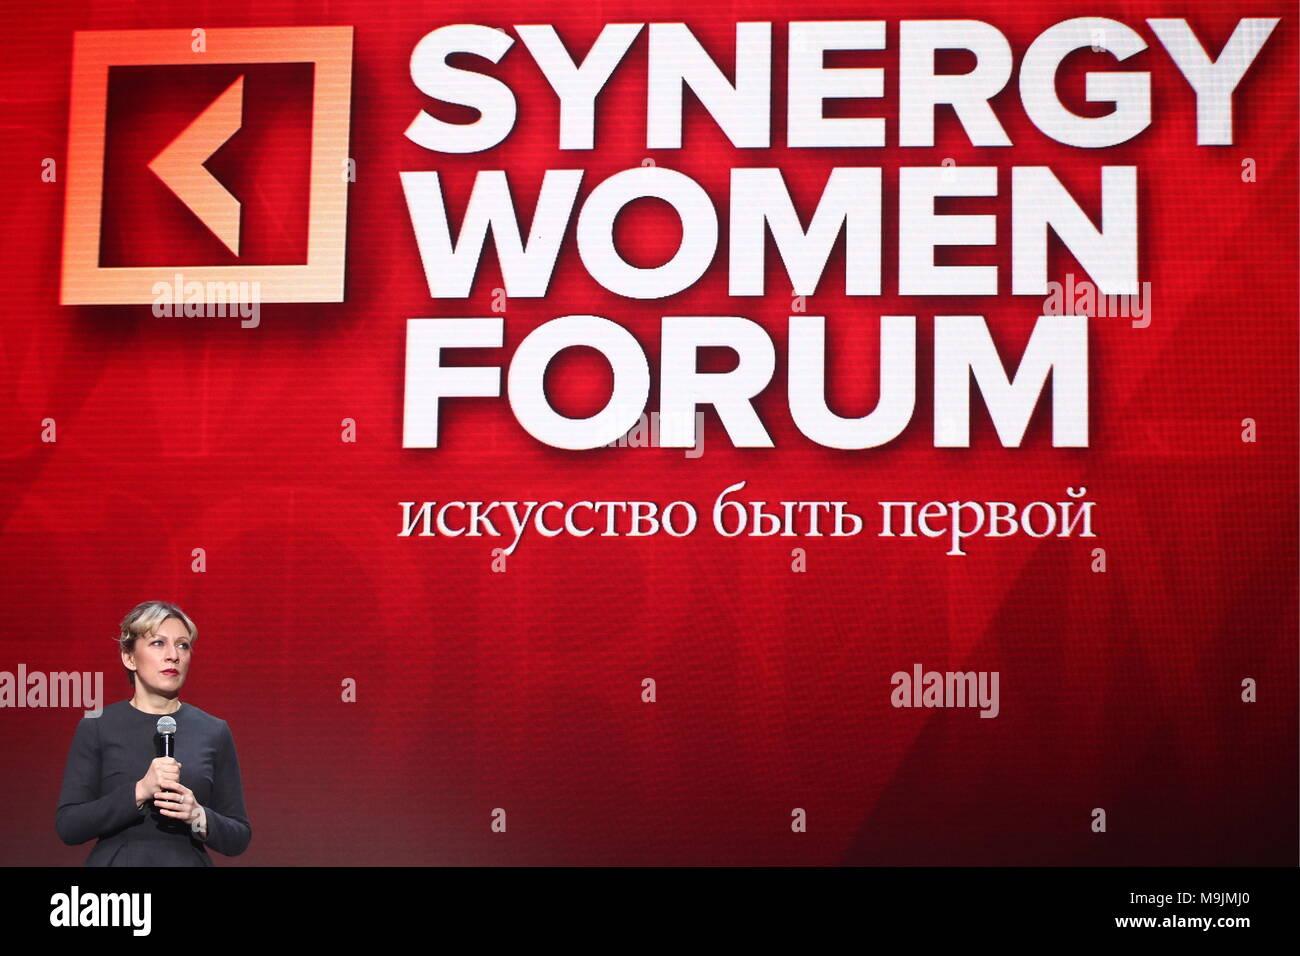 russian women forum